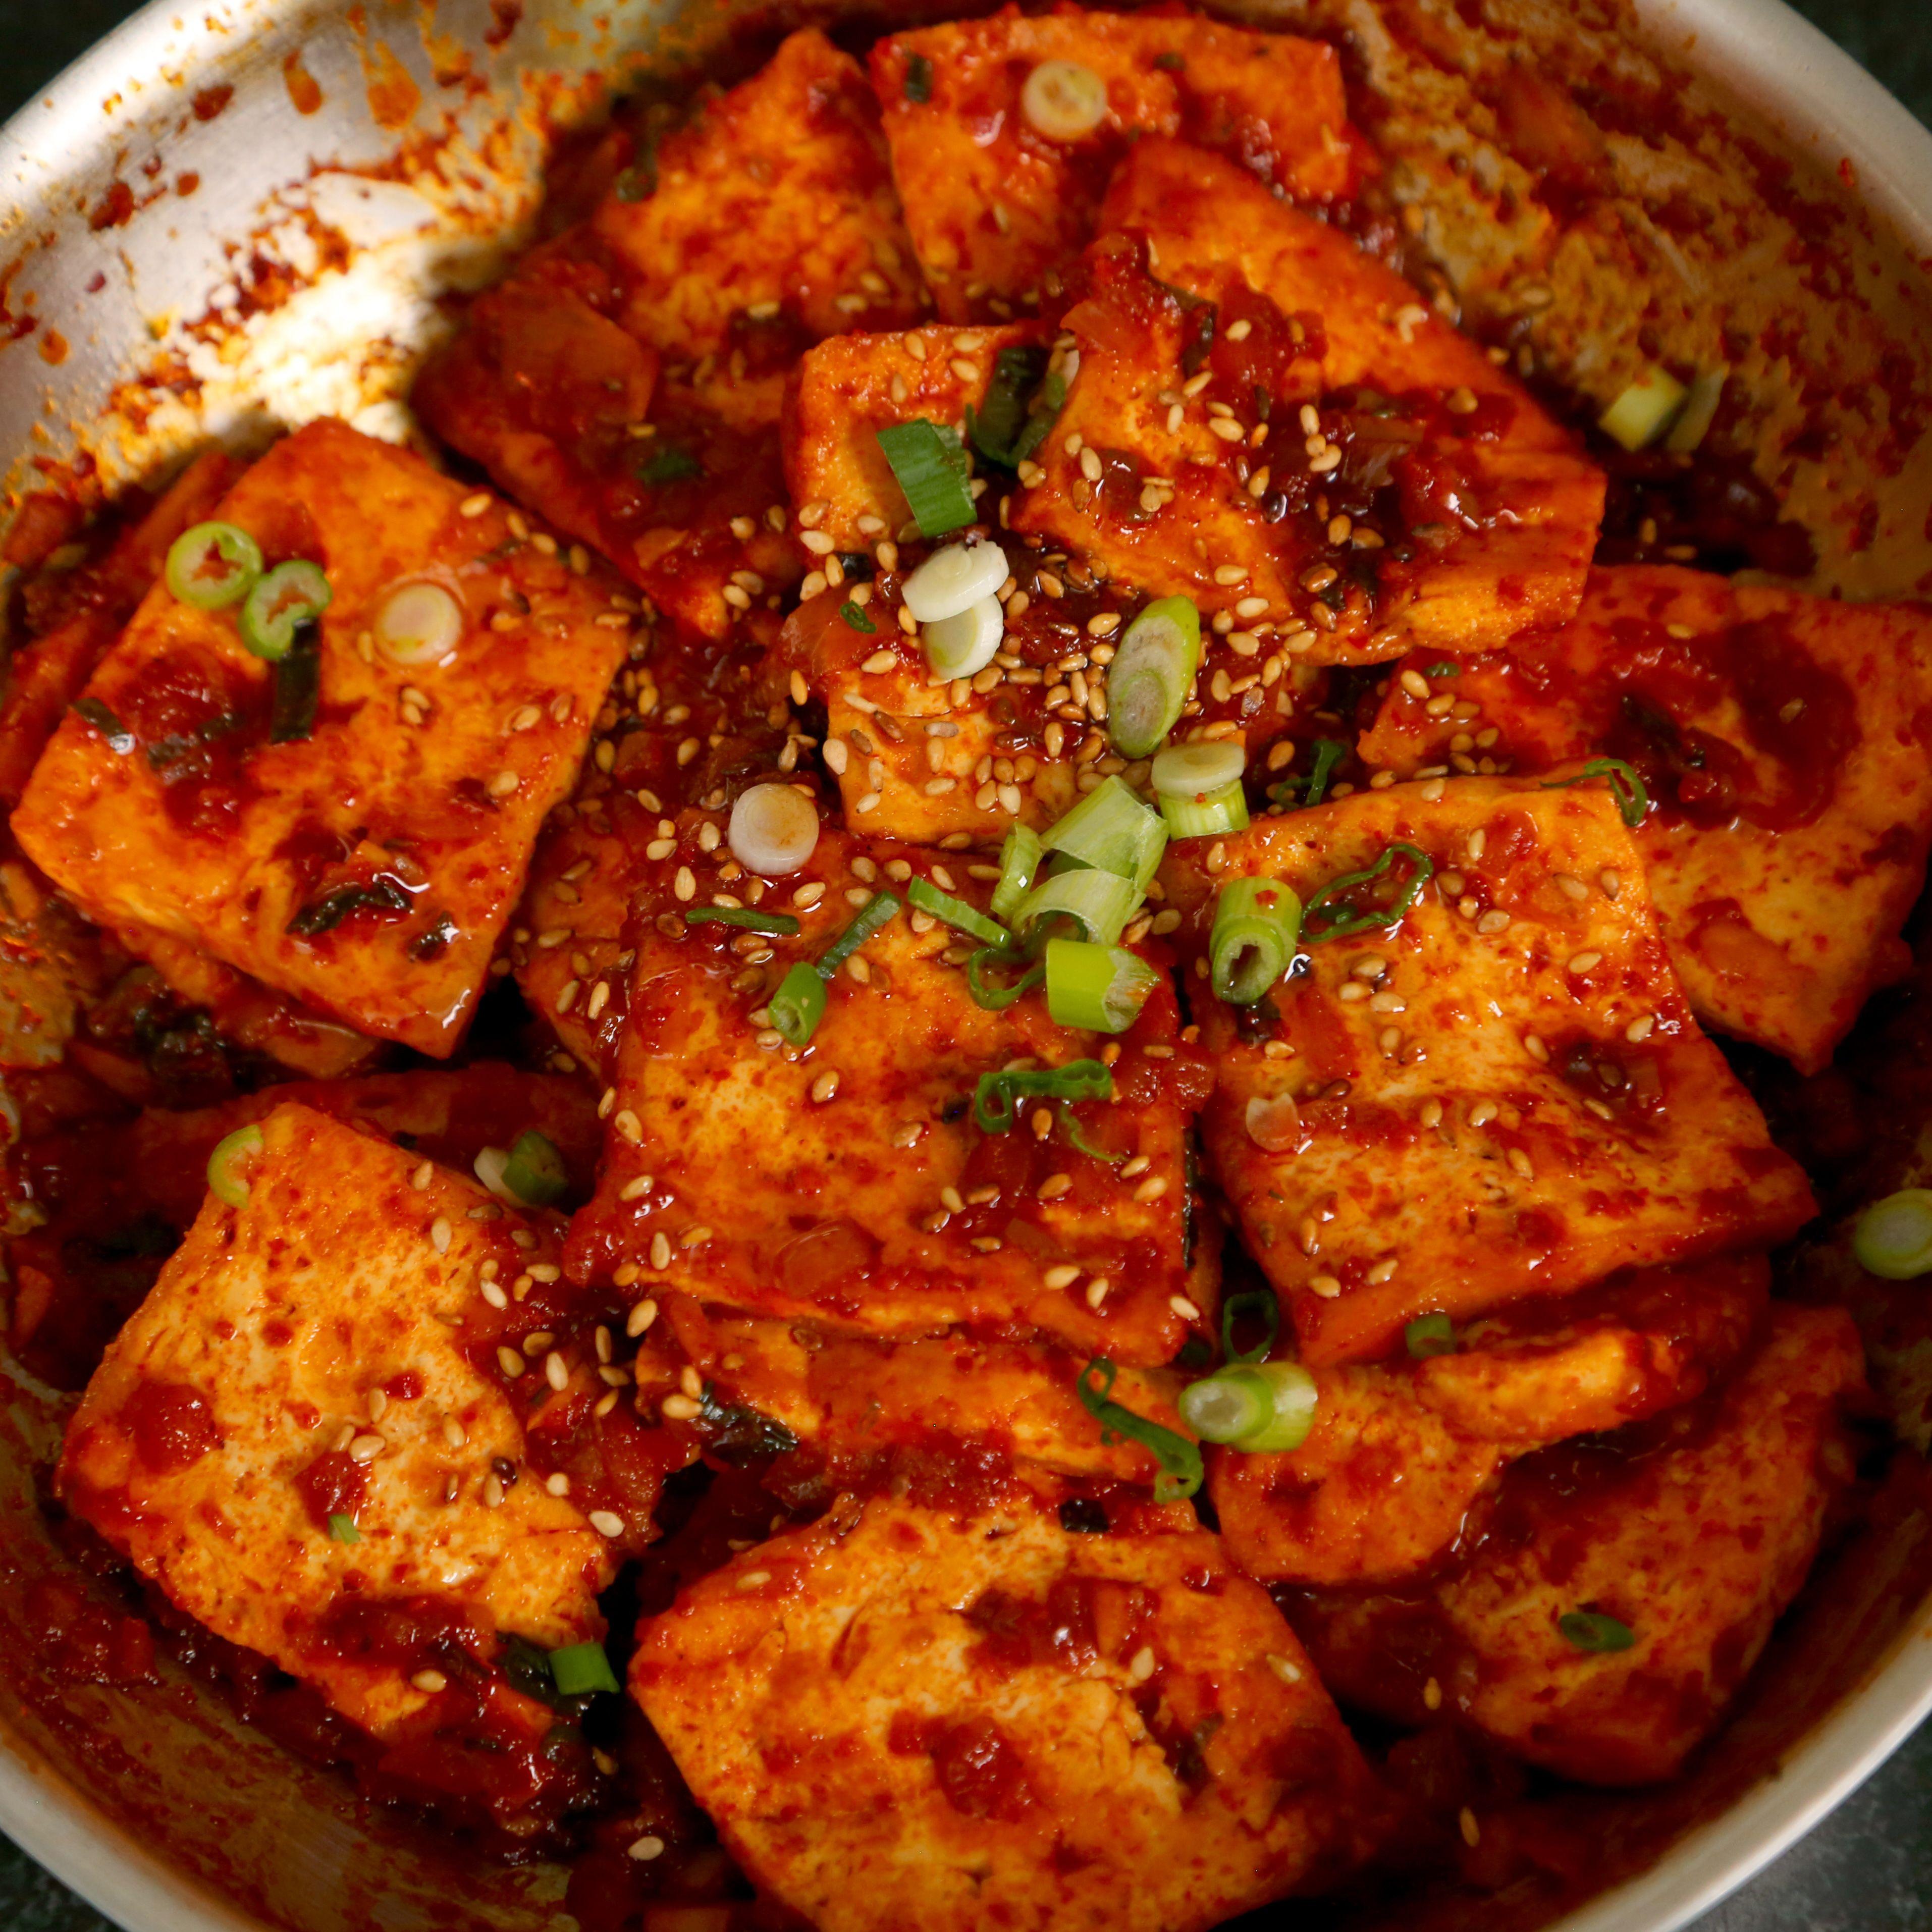 Dubu jorim recipe tofu korean food recipes and korean dubu jorim veg recipeskorean food forumfinder Images